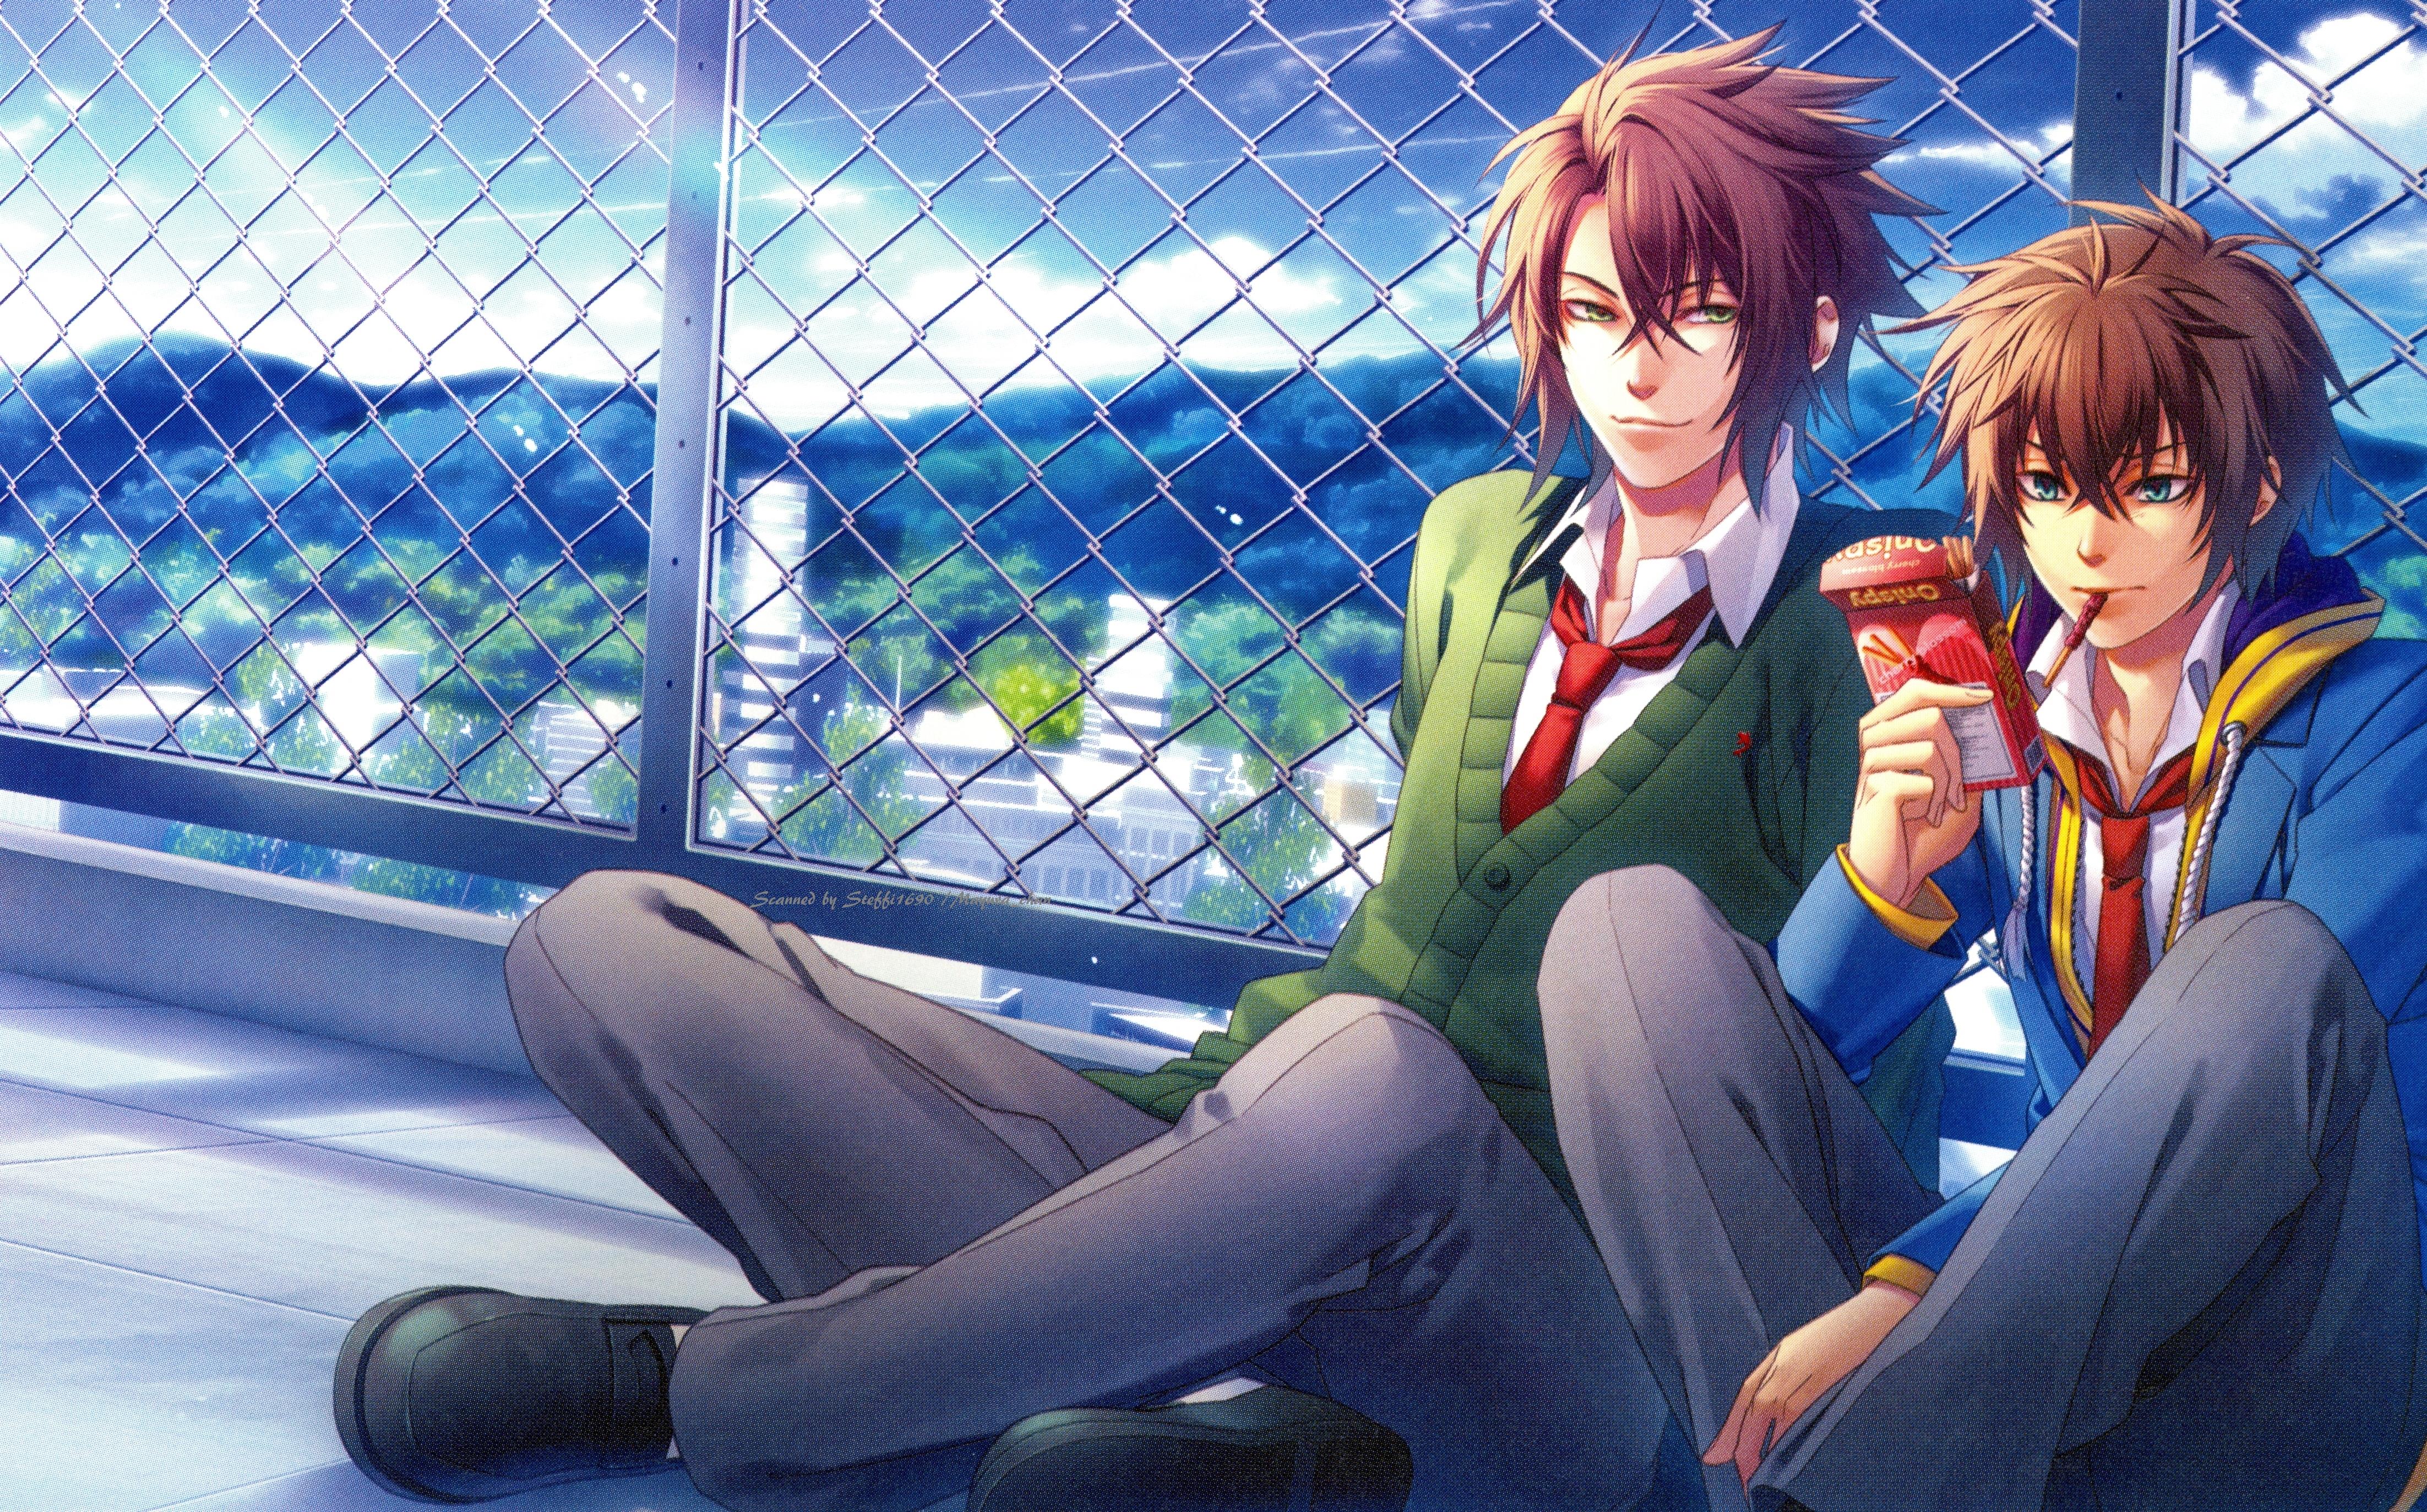 hakuouki ssl sweet school life hakuouki shinsengumi